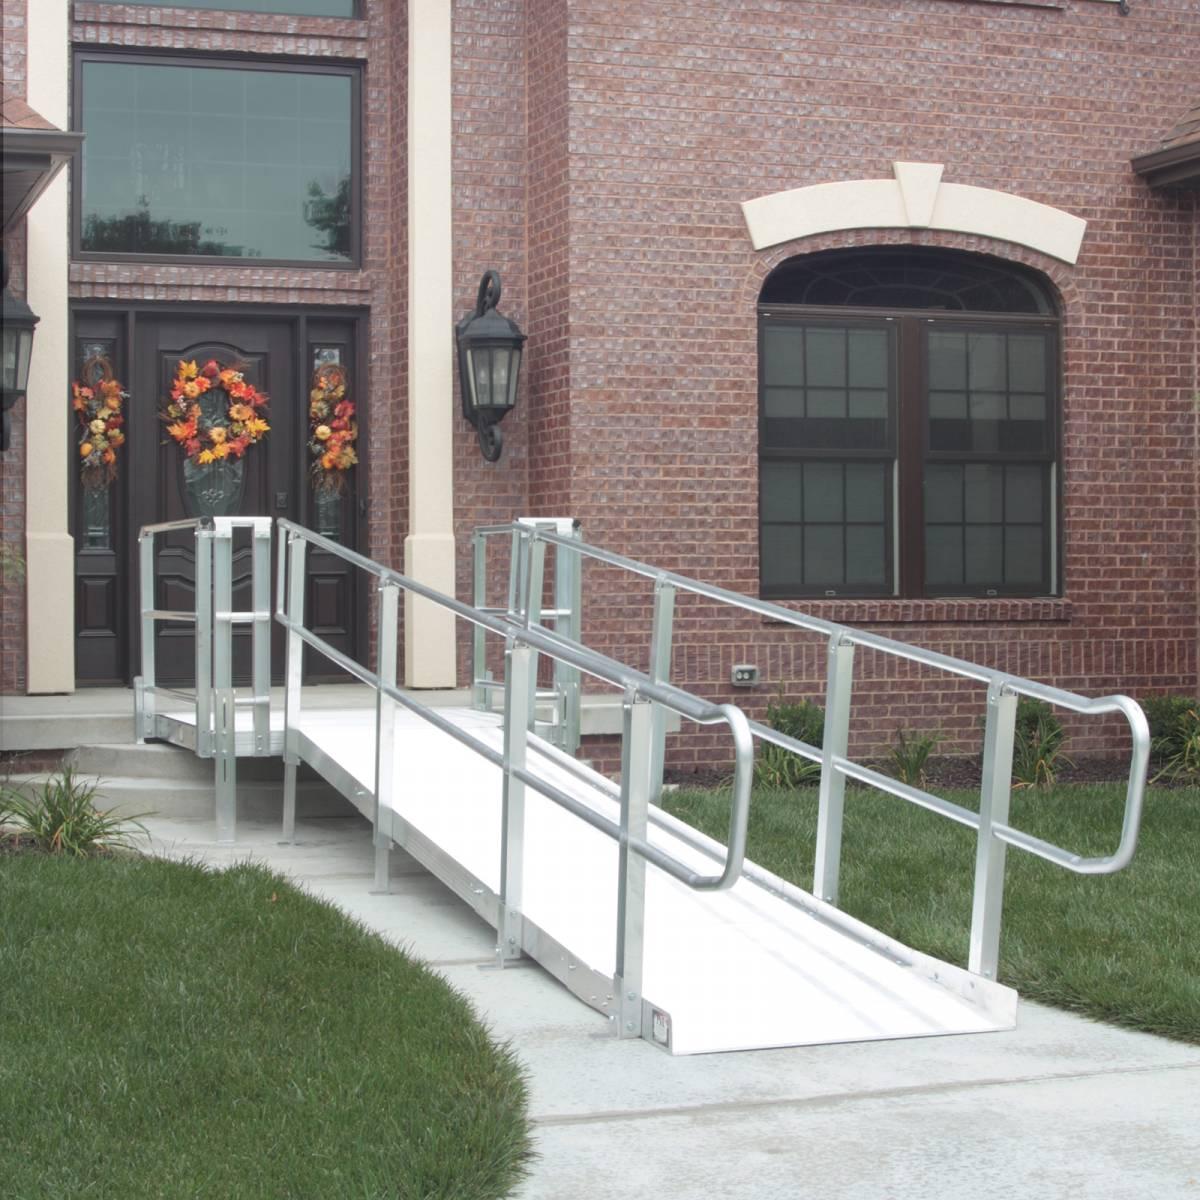 buy modular ramps from McCann's Medical